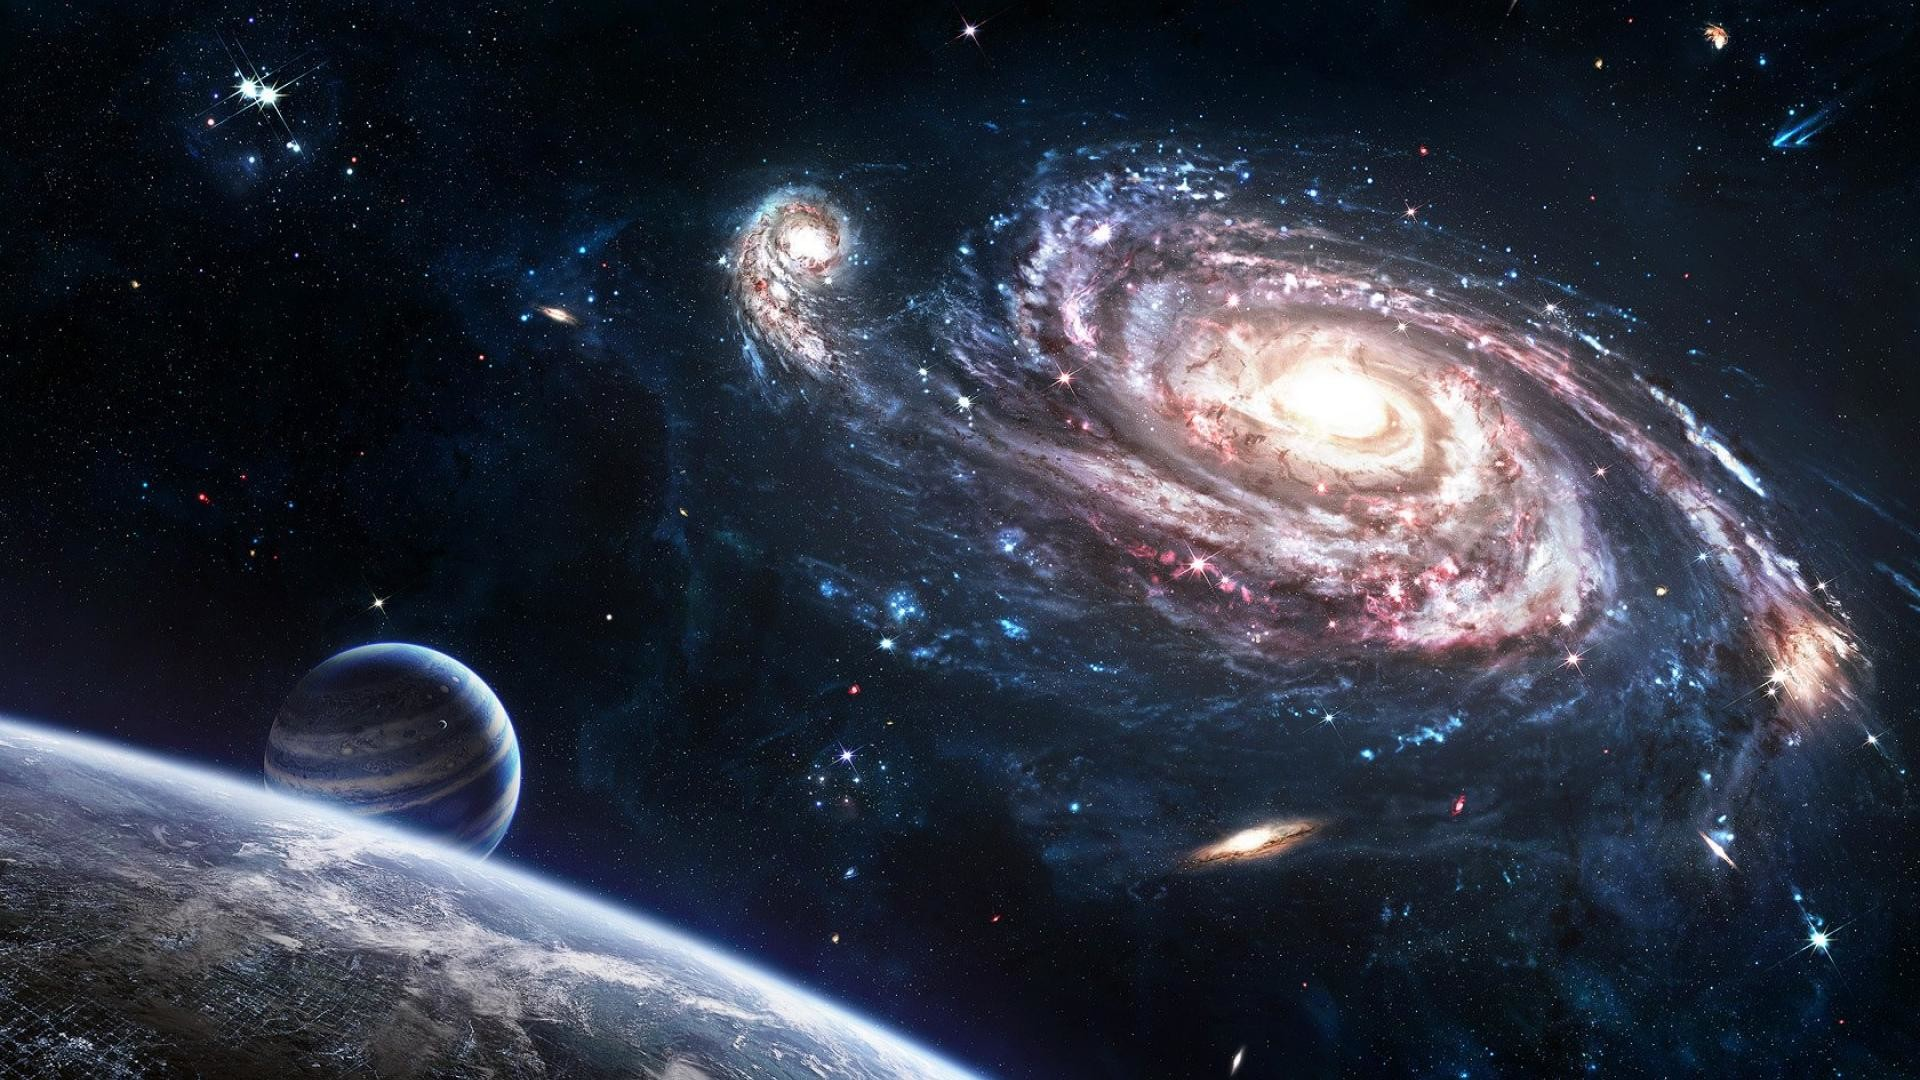 Hd Universe Wallpaper: Planet Space Universe Earth Galaxy Stars Cosmic Hd  Wallpaper 1920x1080px